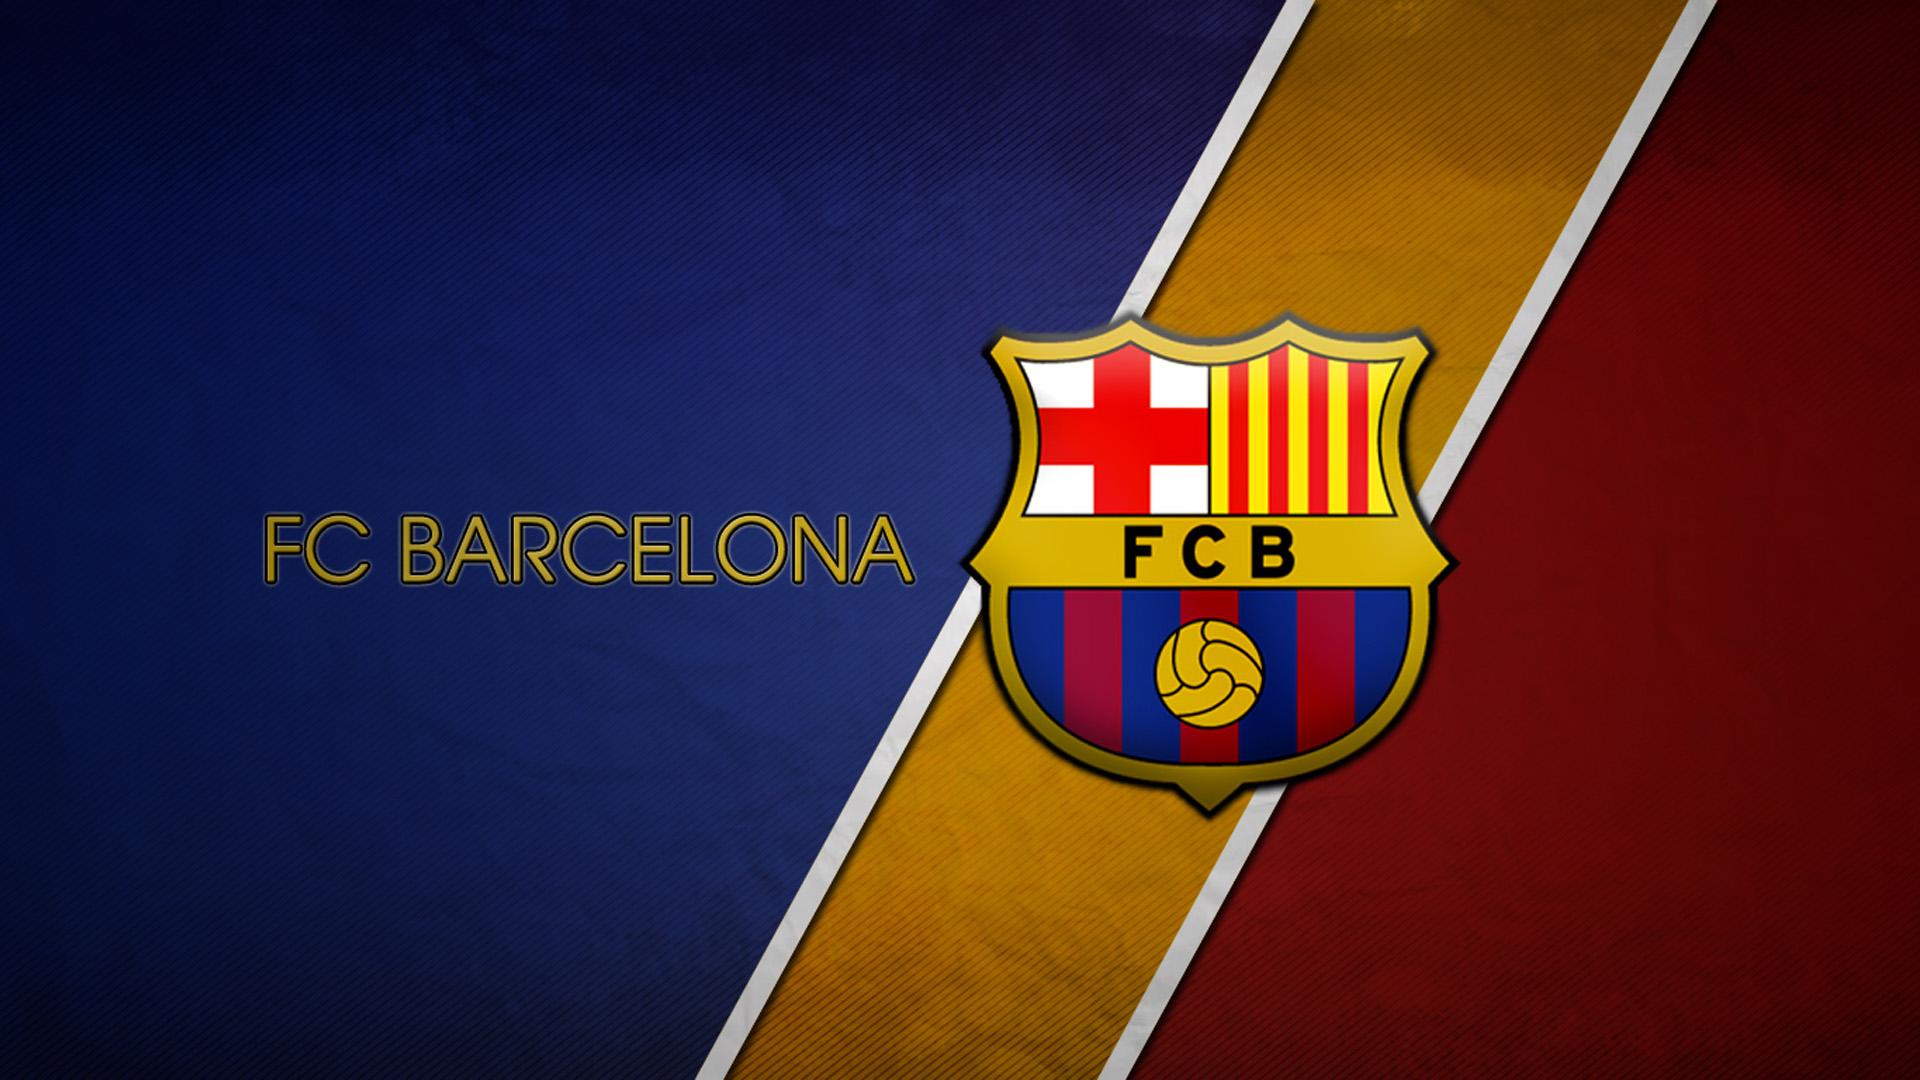 44 Fc Barcelona Wallpaper 1080p On Wallpapersafari